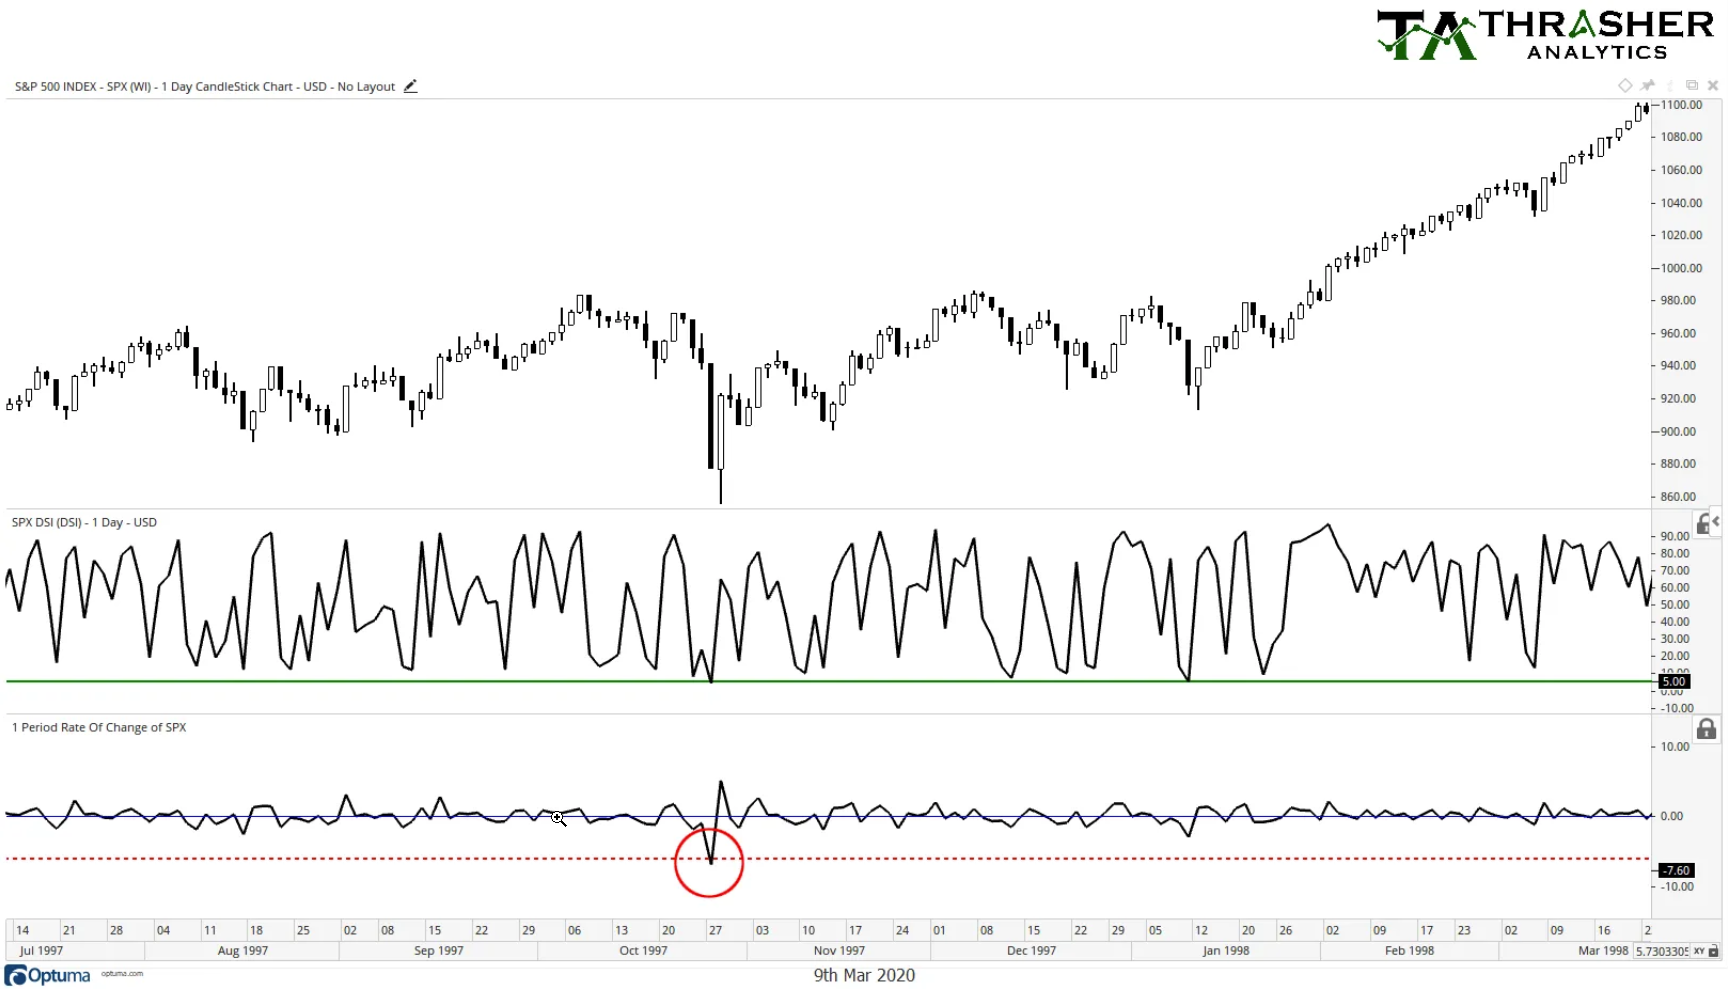 S&P 500: 1997